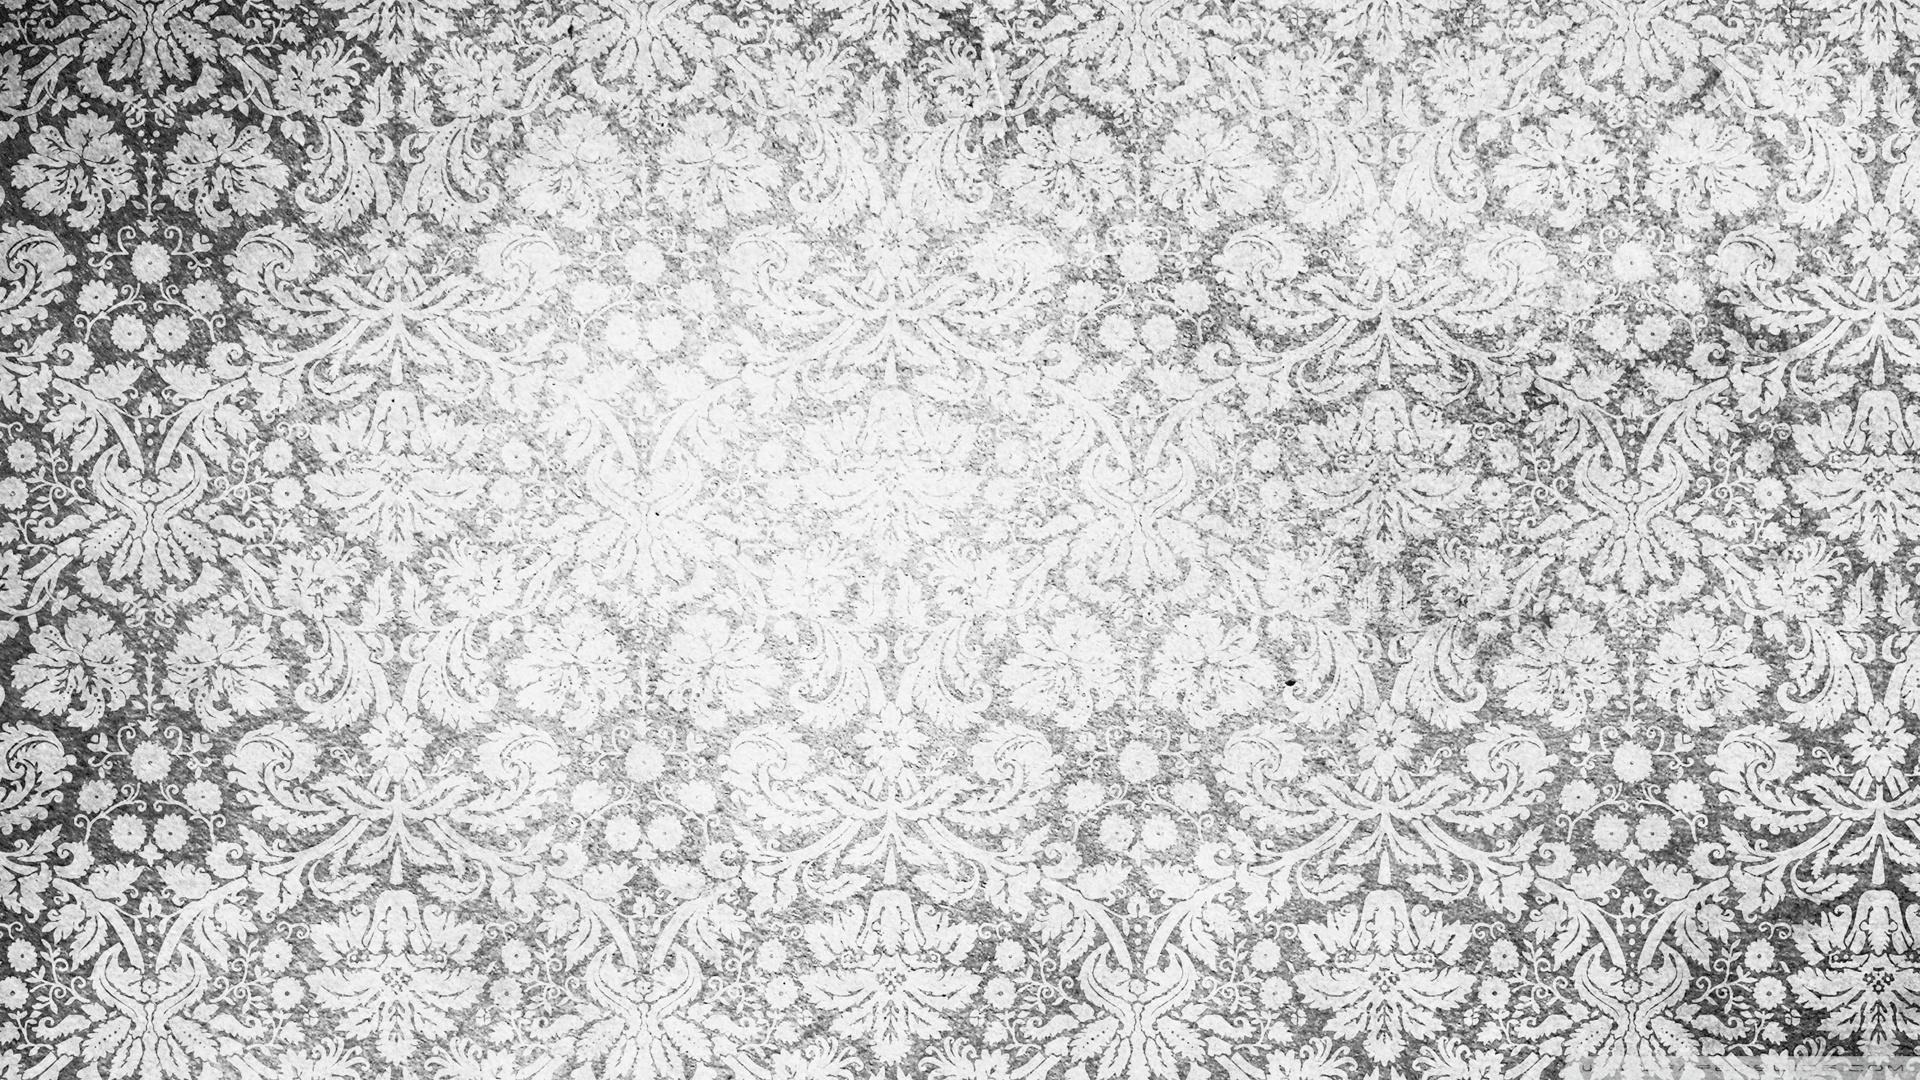 Free Download Vintage Pattern Black And White Wallpaper